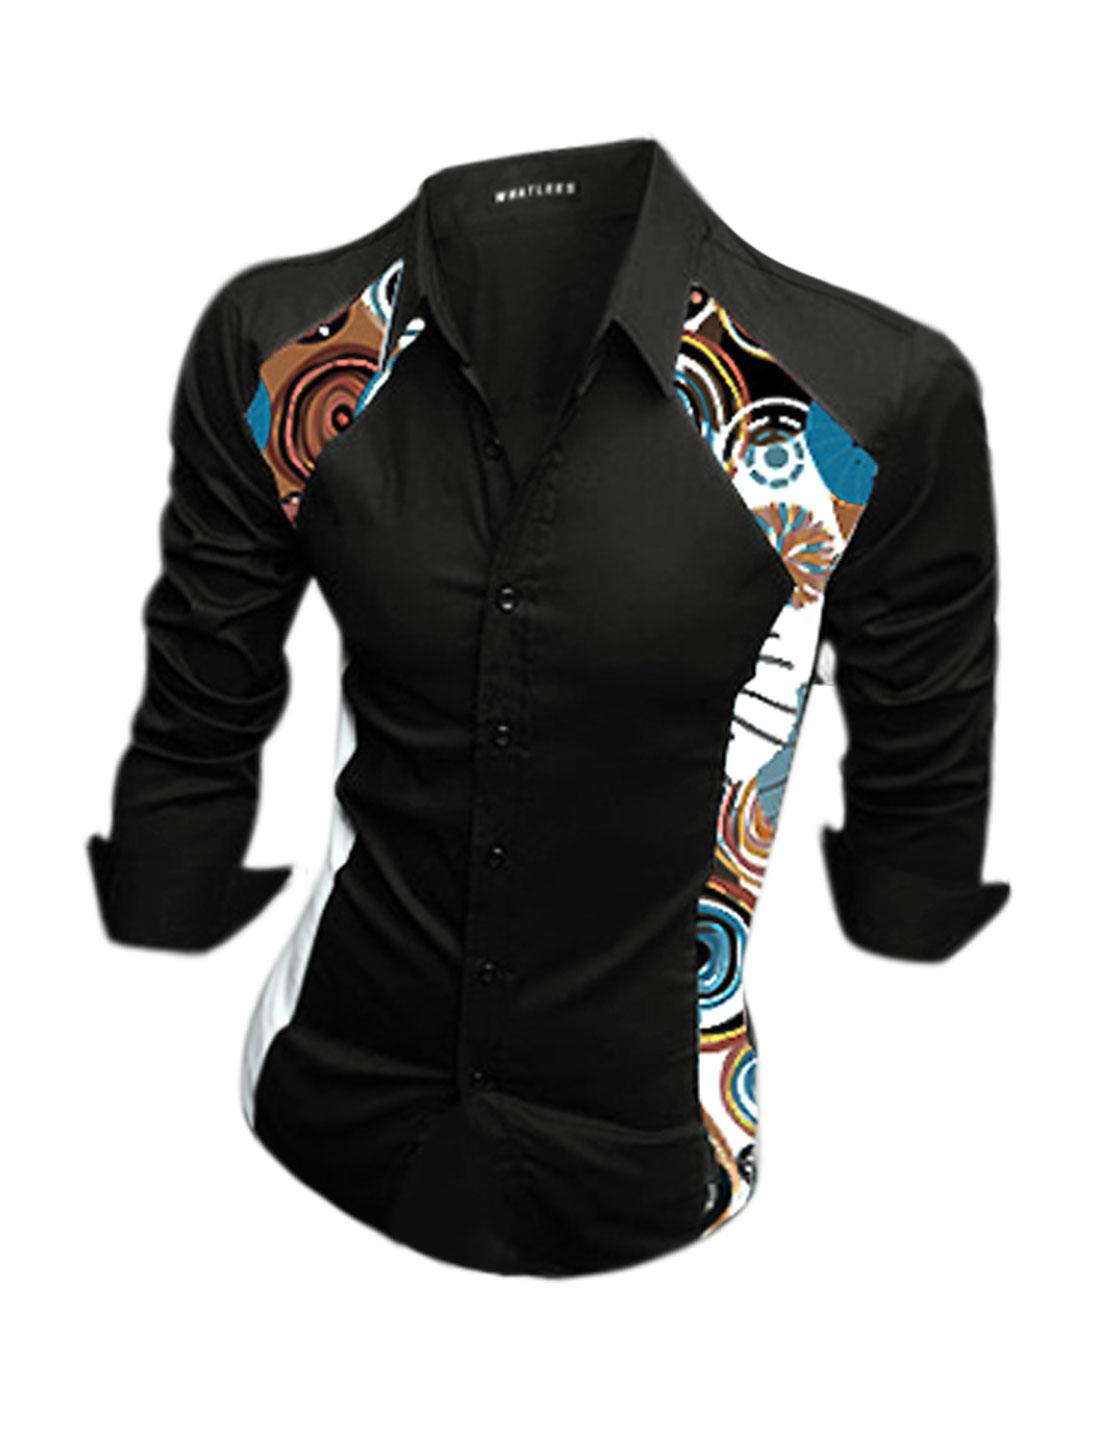 Men Long Sleeves Collared Novelty Print Slim Fit Shirt Black M